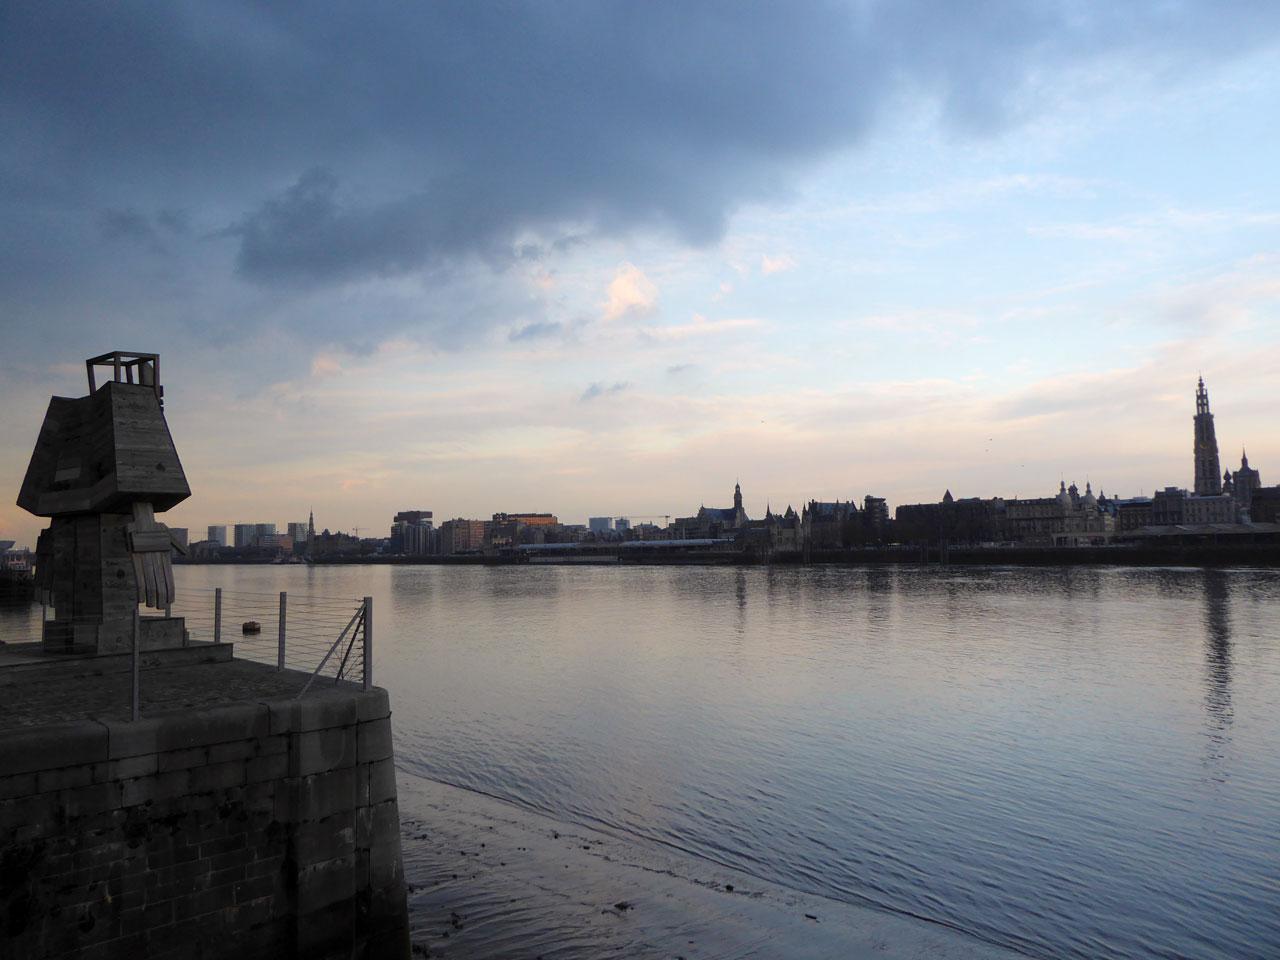 View from the Linkeroever, Antwerp